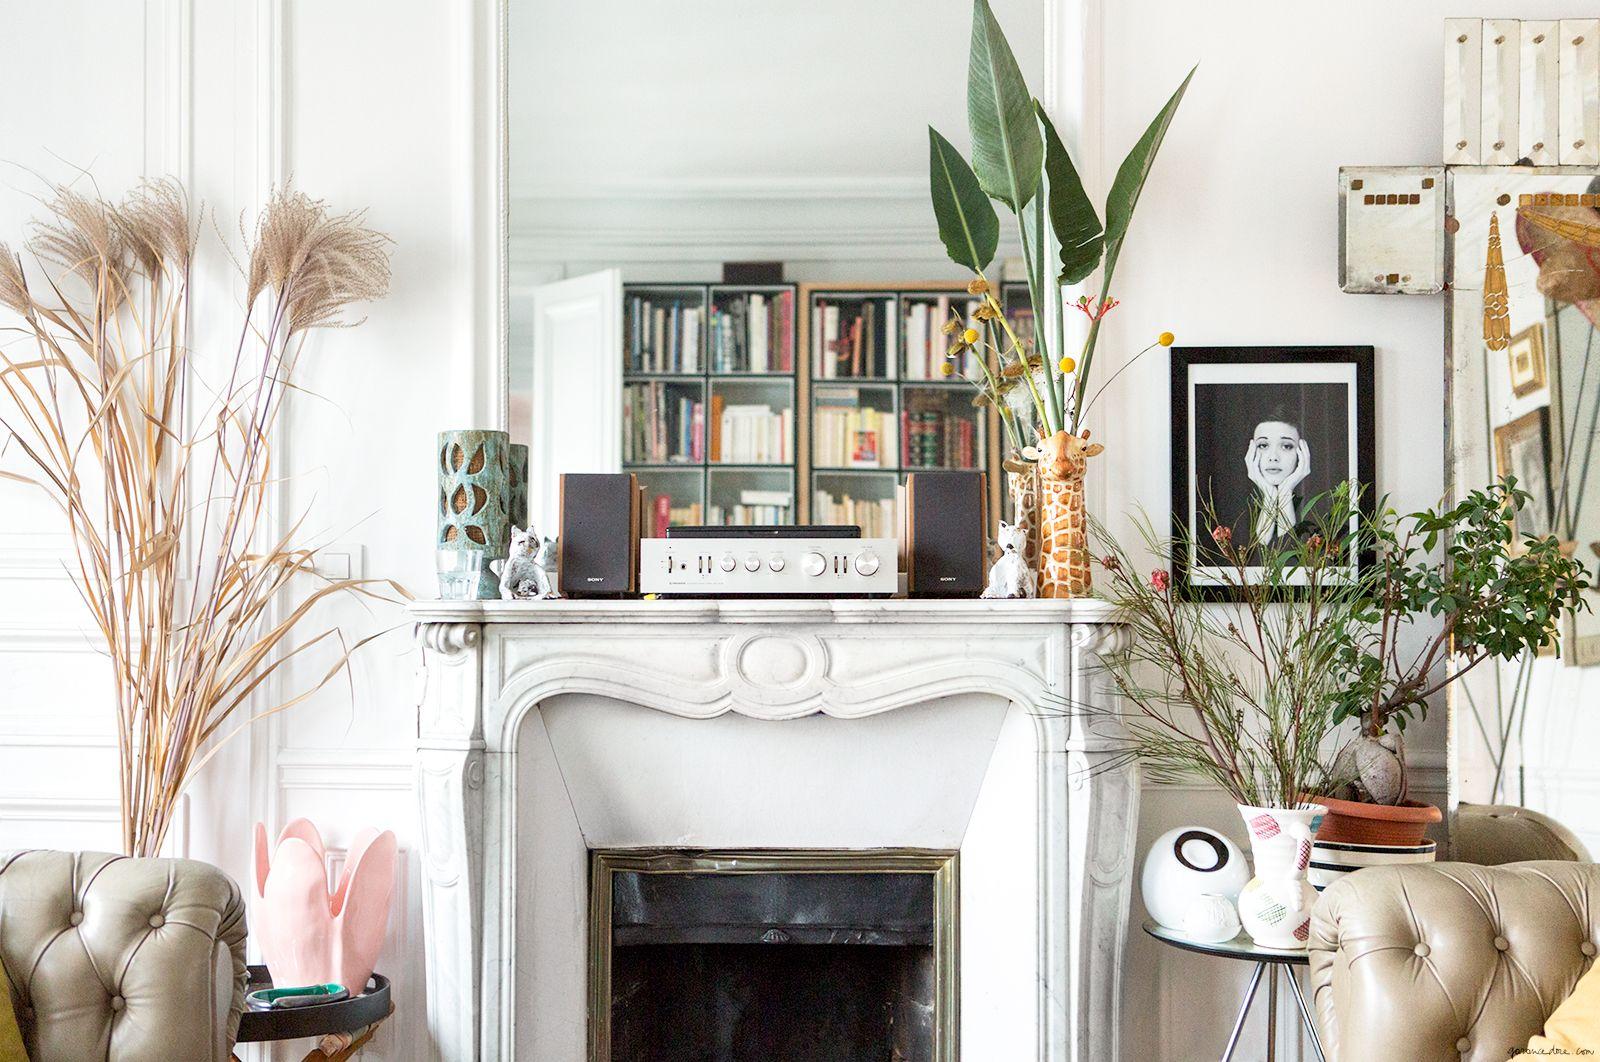 eclectic alix thomsen in 2018 atelier dor interiors pinterest rh pinterest com